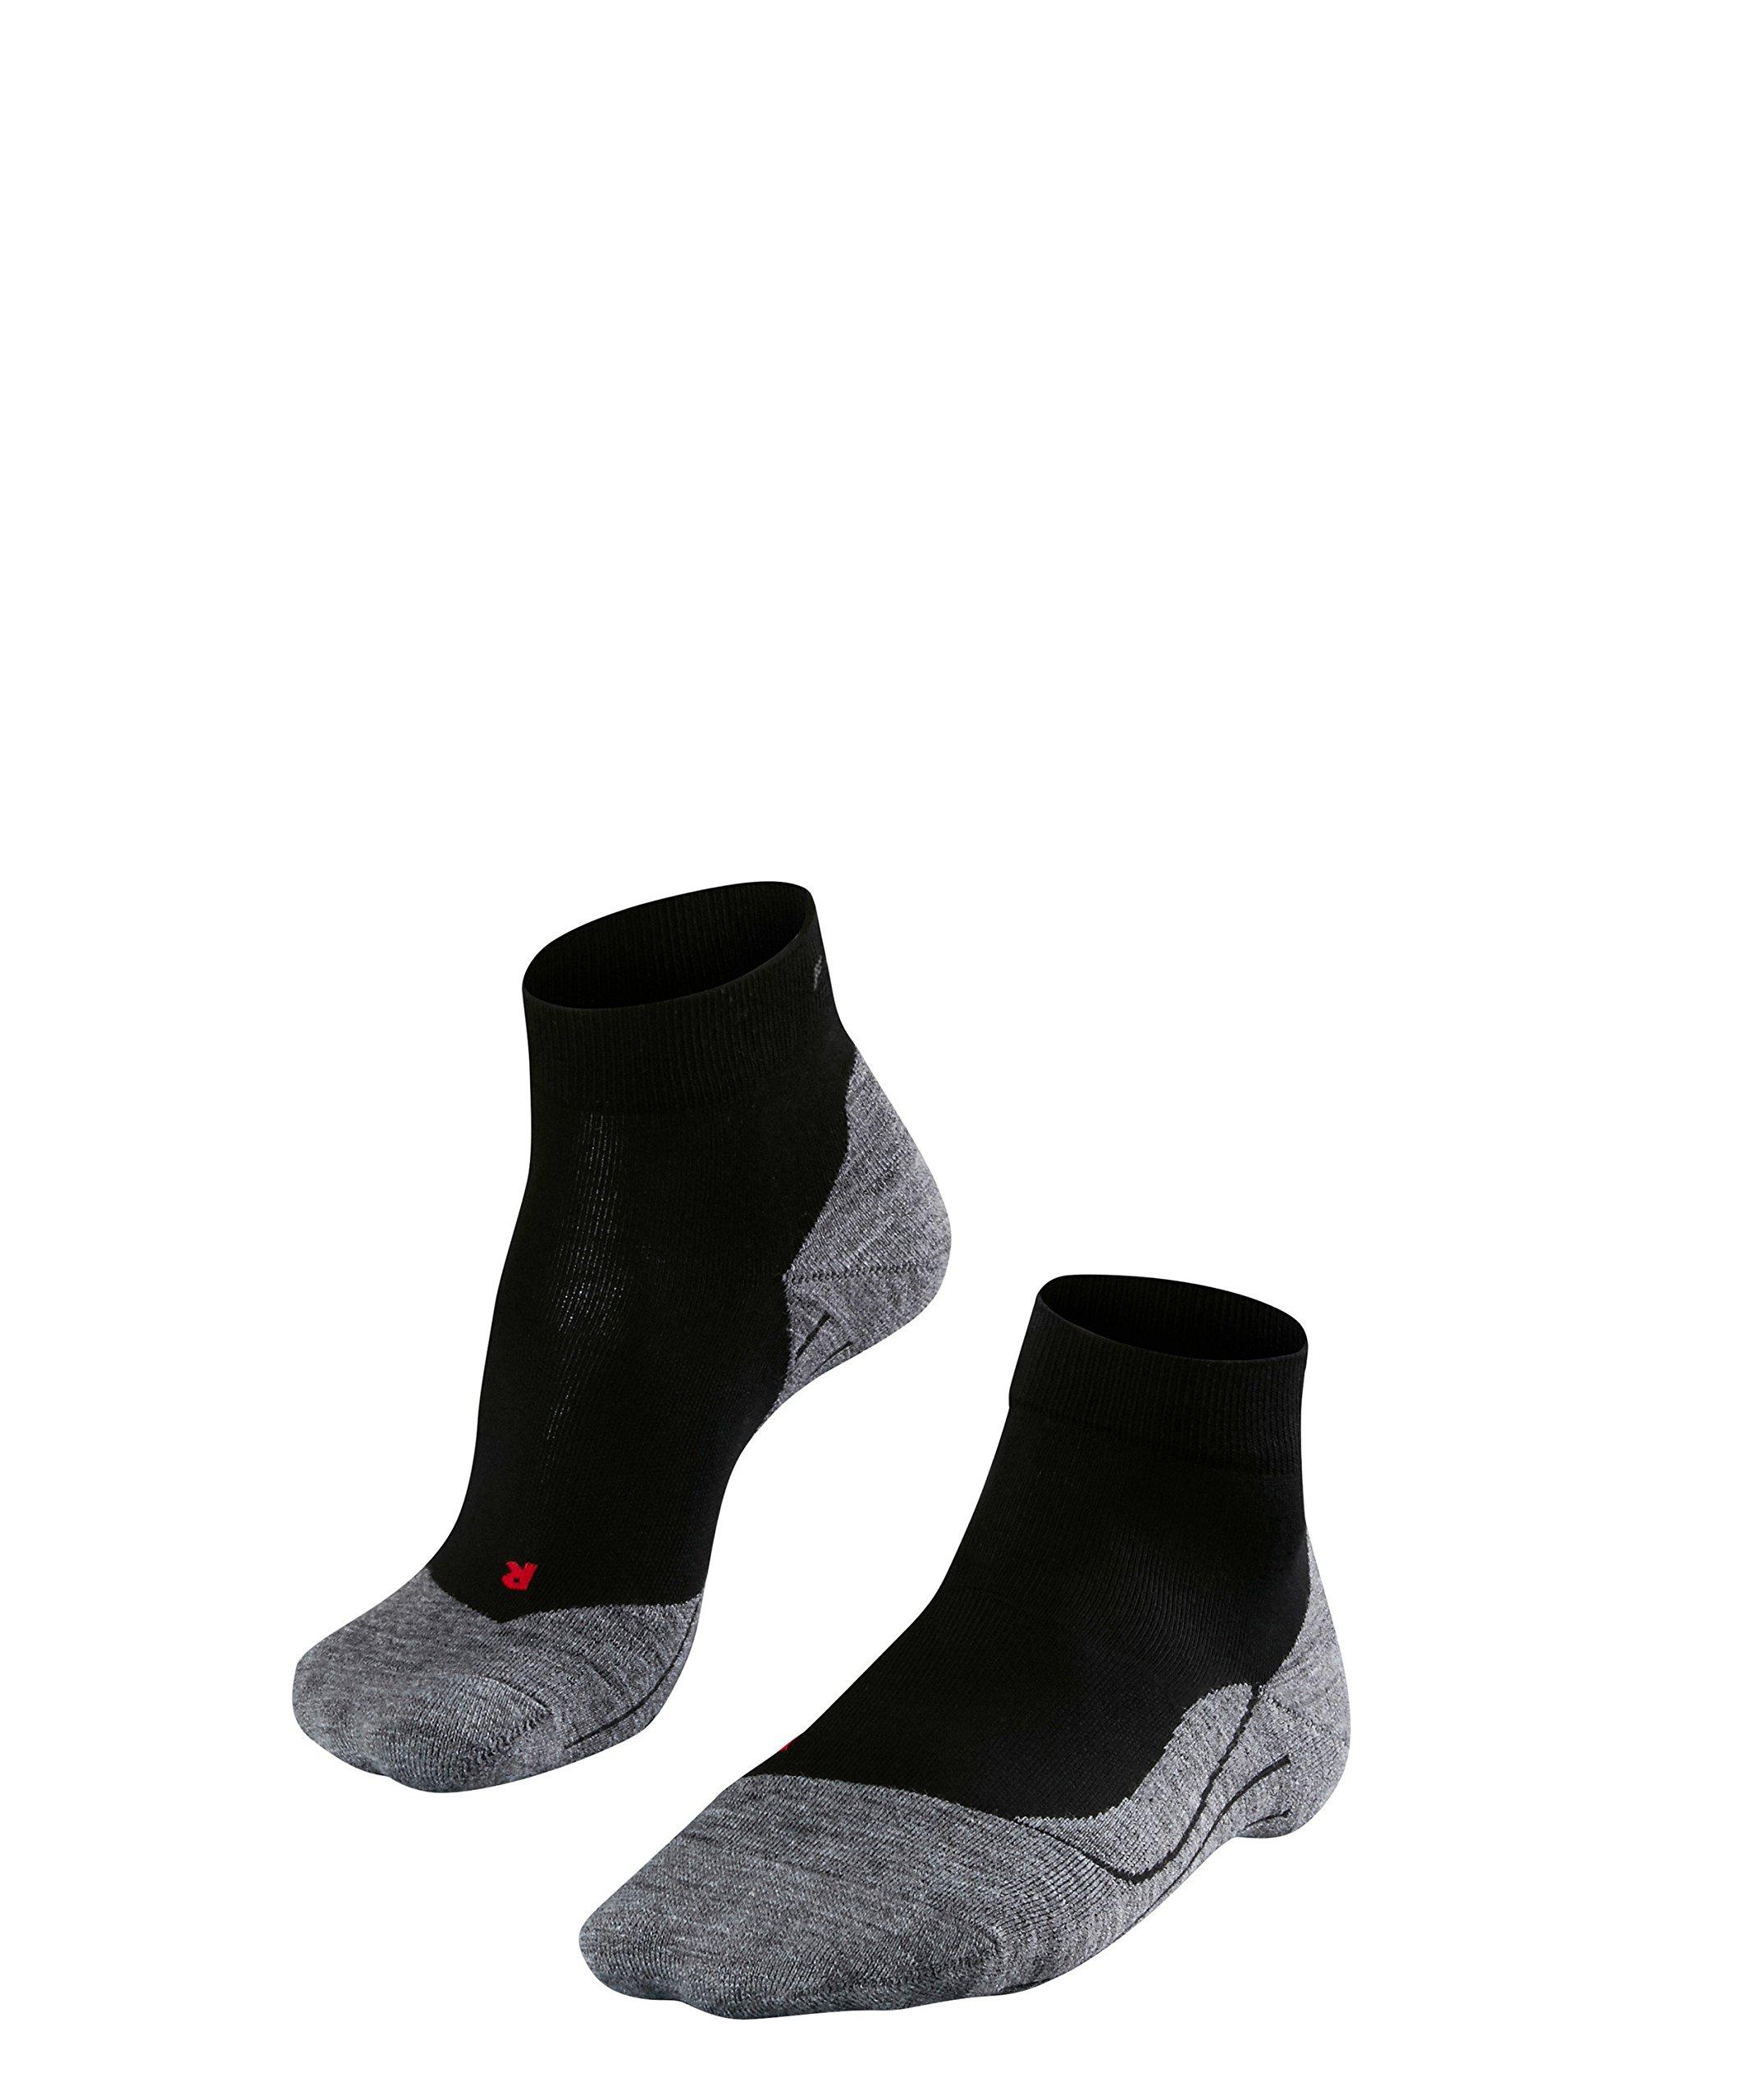 Falke ESS Men Running Ru4 Short Socks Size 44 - 45 Black/Mix